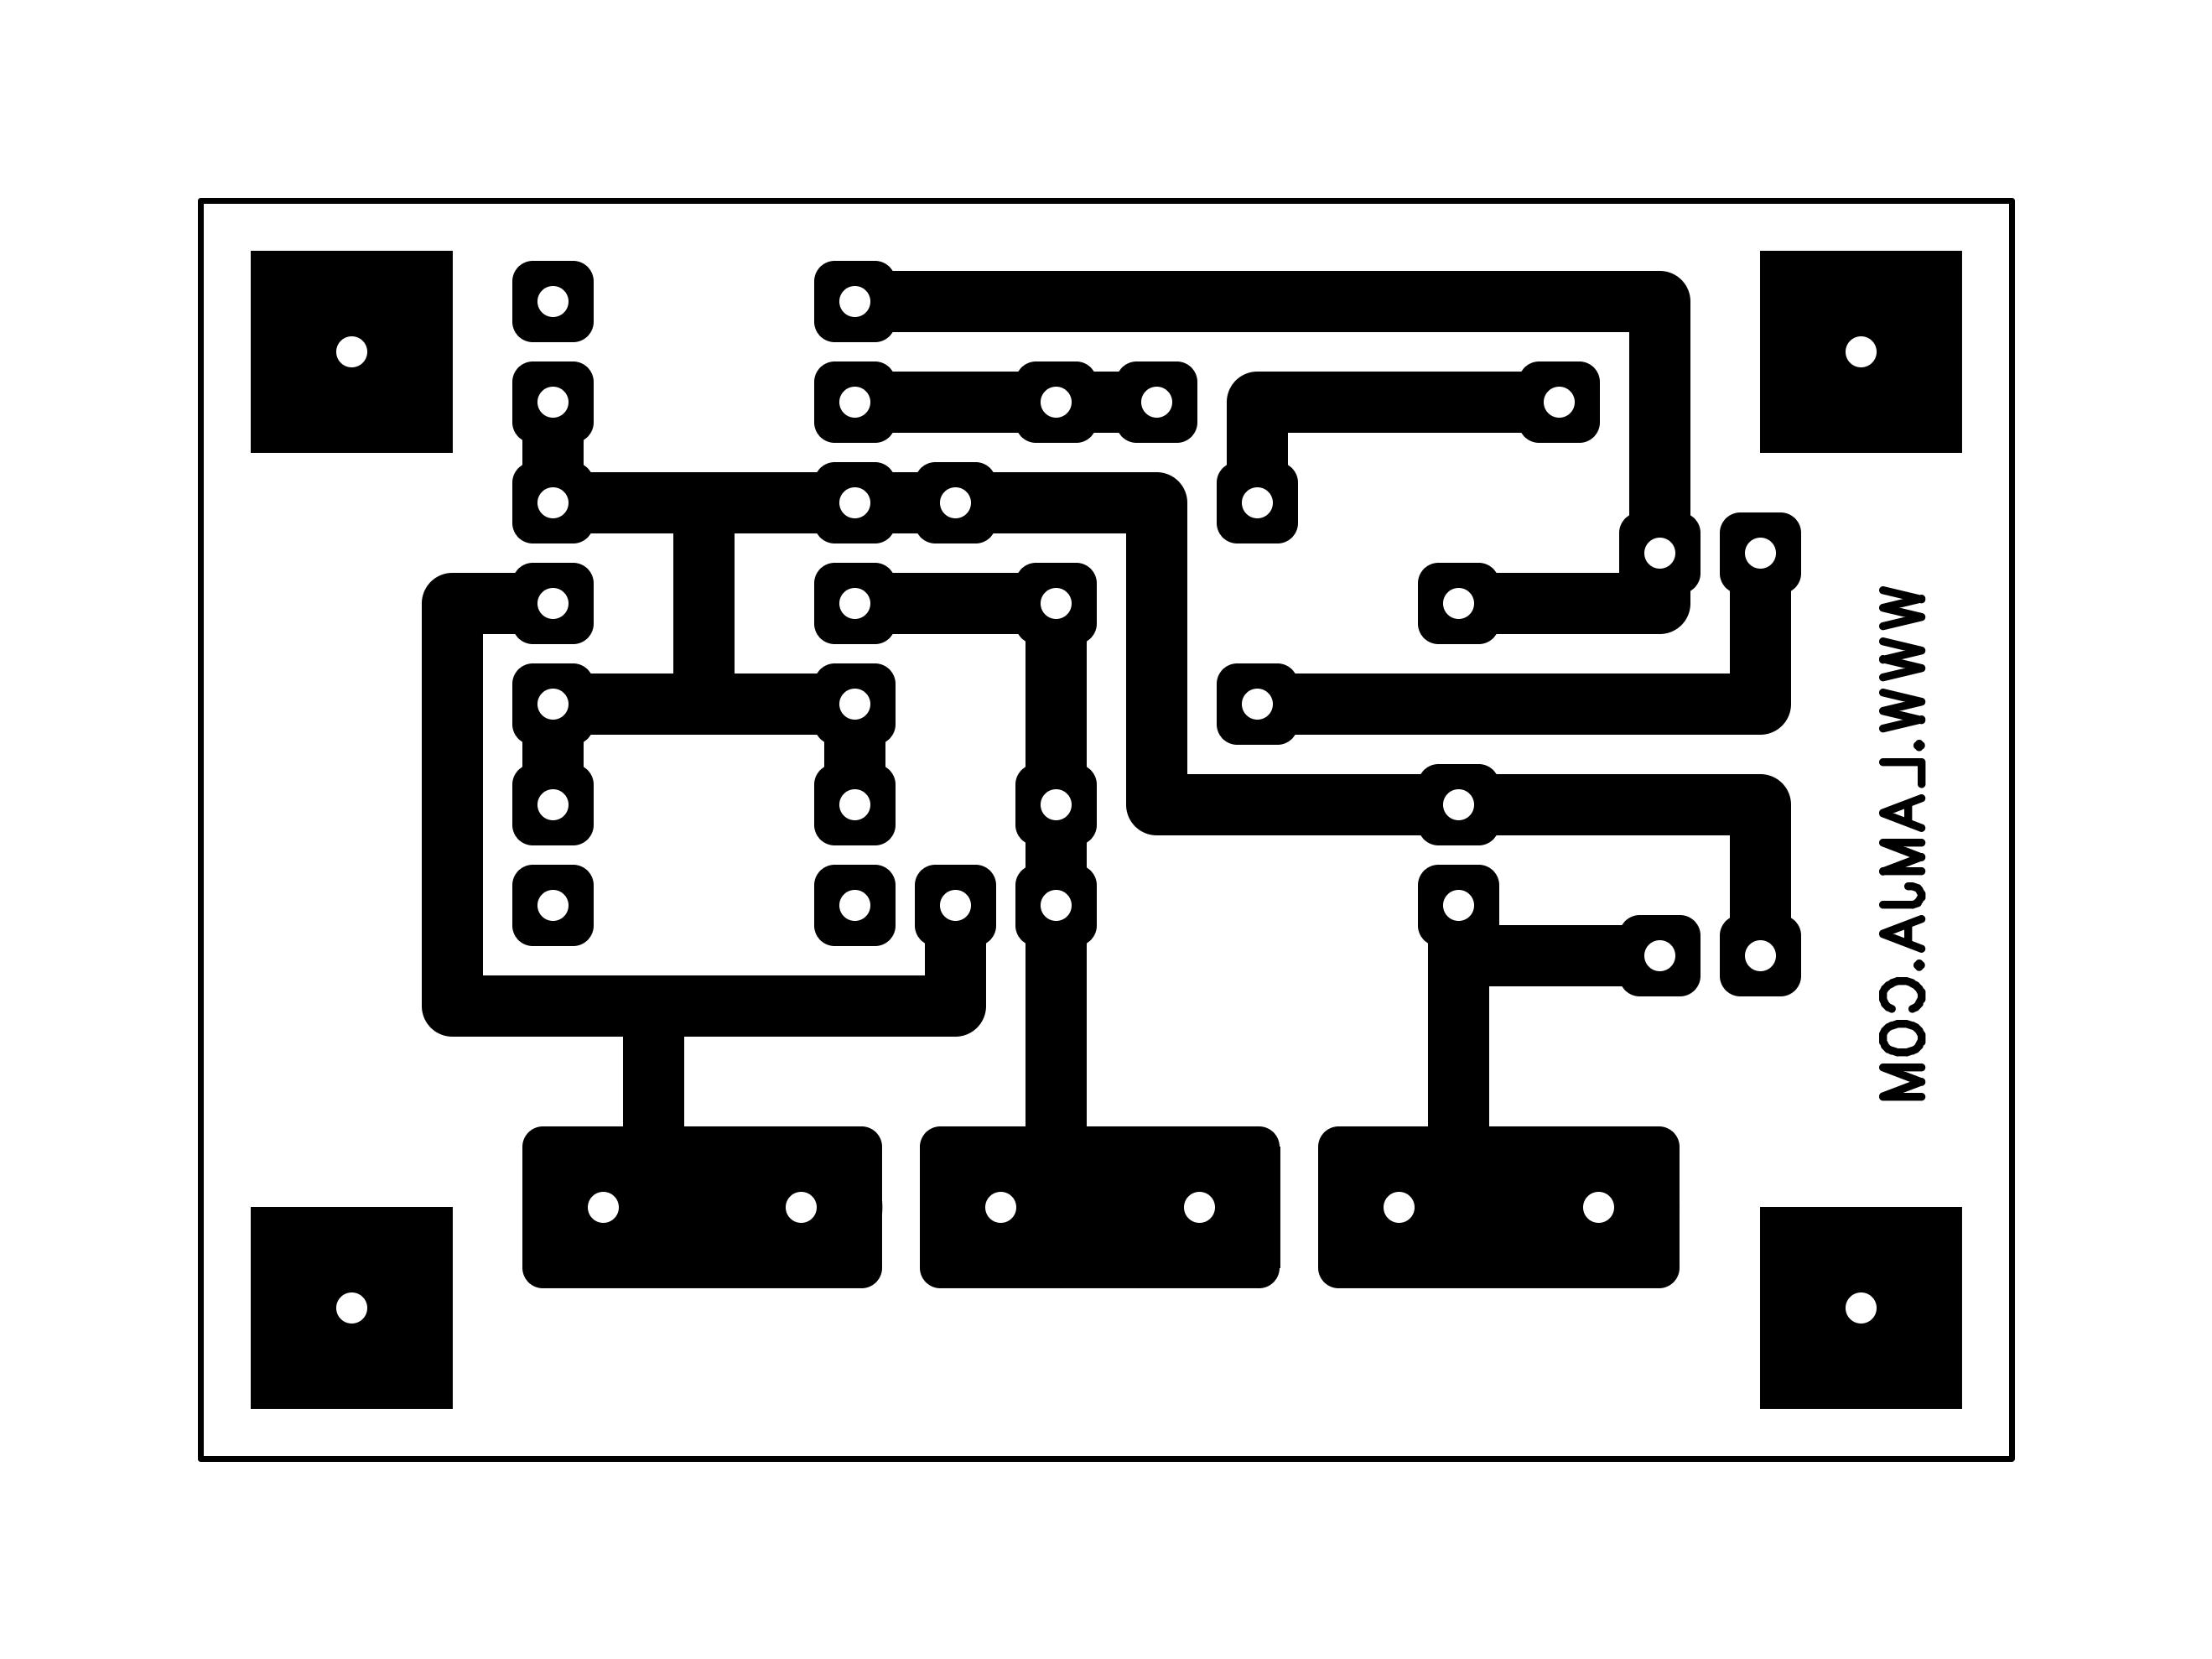 simple pulse generator using lm324 opamp